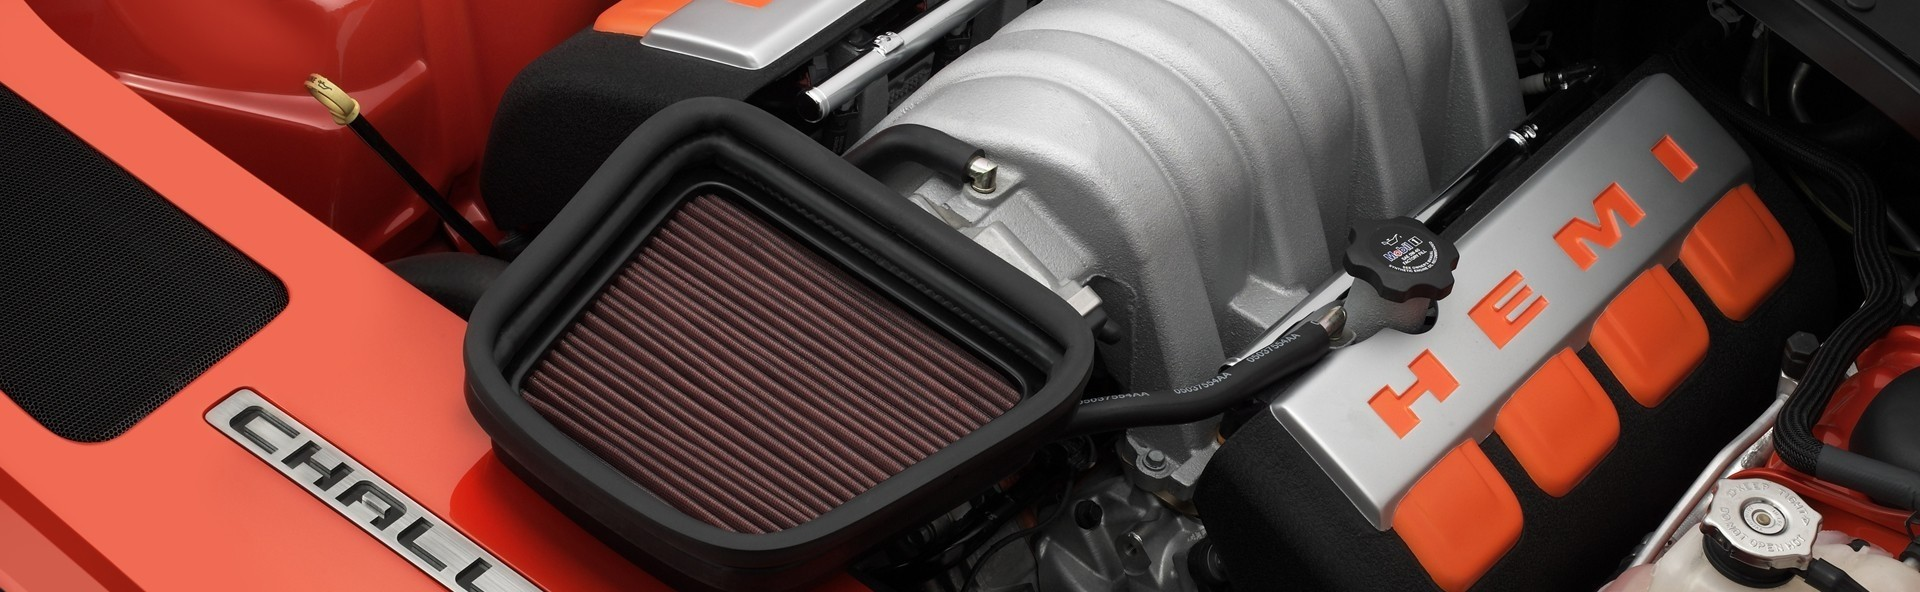 fondo-de-motor-de-coche-deportivo-455